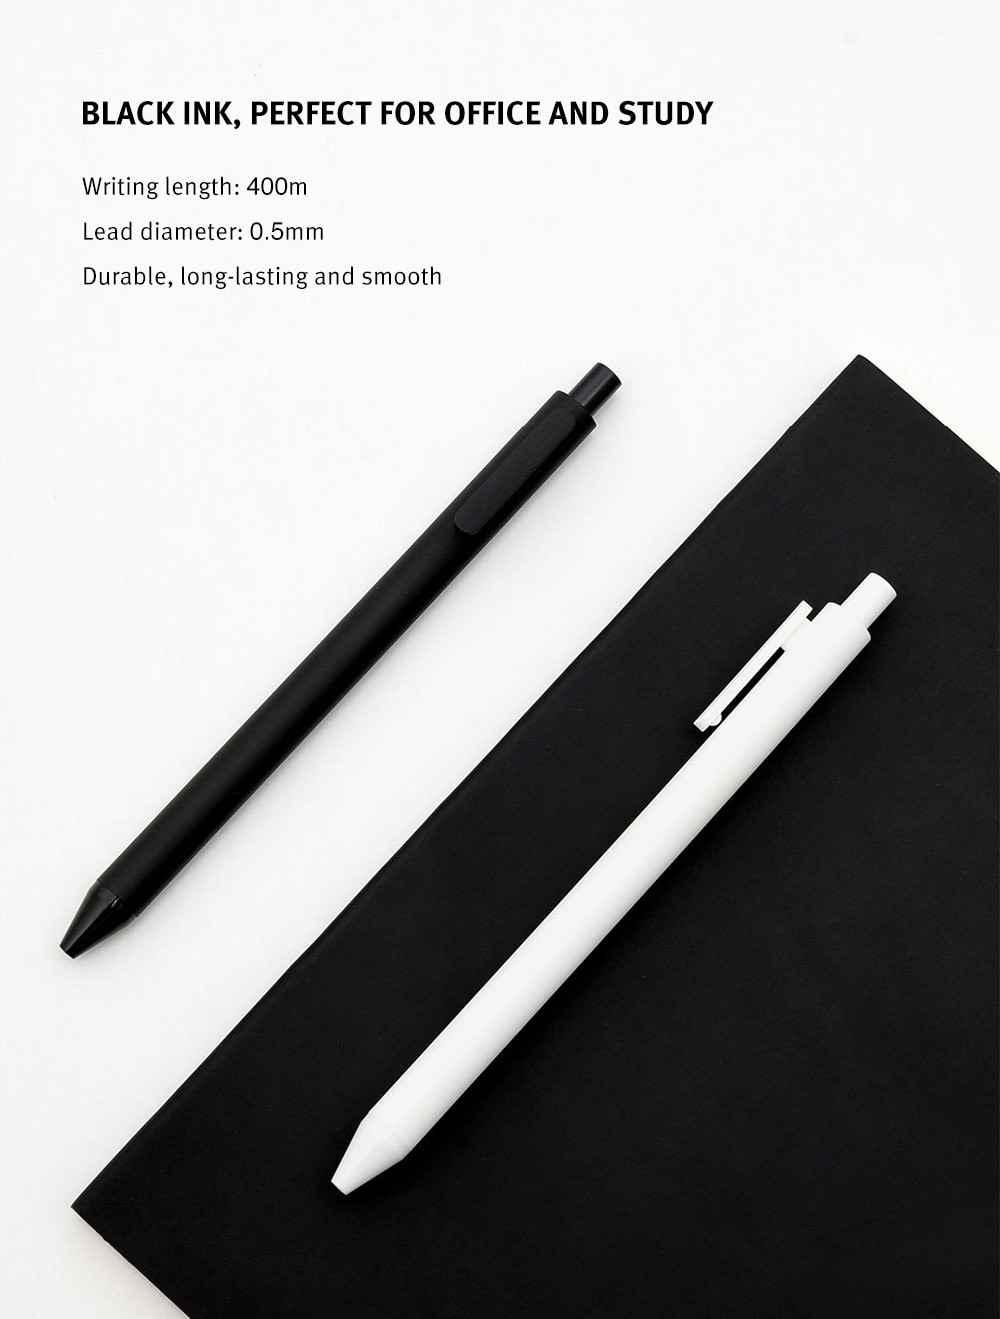 Asli Xiao Mi Kaco Roller Mi Penandatanganan Pena Gal Tinta Menulis Halus Tahan Lama Penandatanganan Hitam Isi Ulang 1 Pcs Eceran 0.5 MM